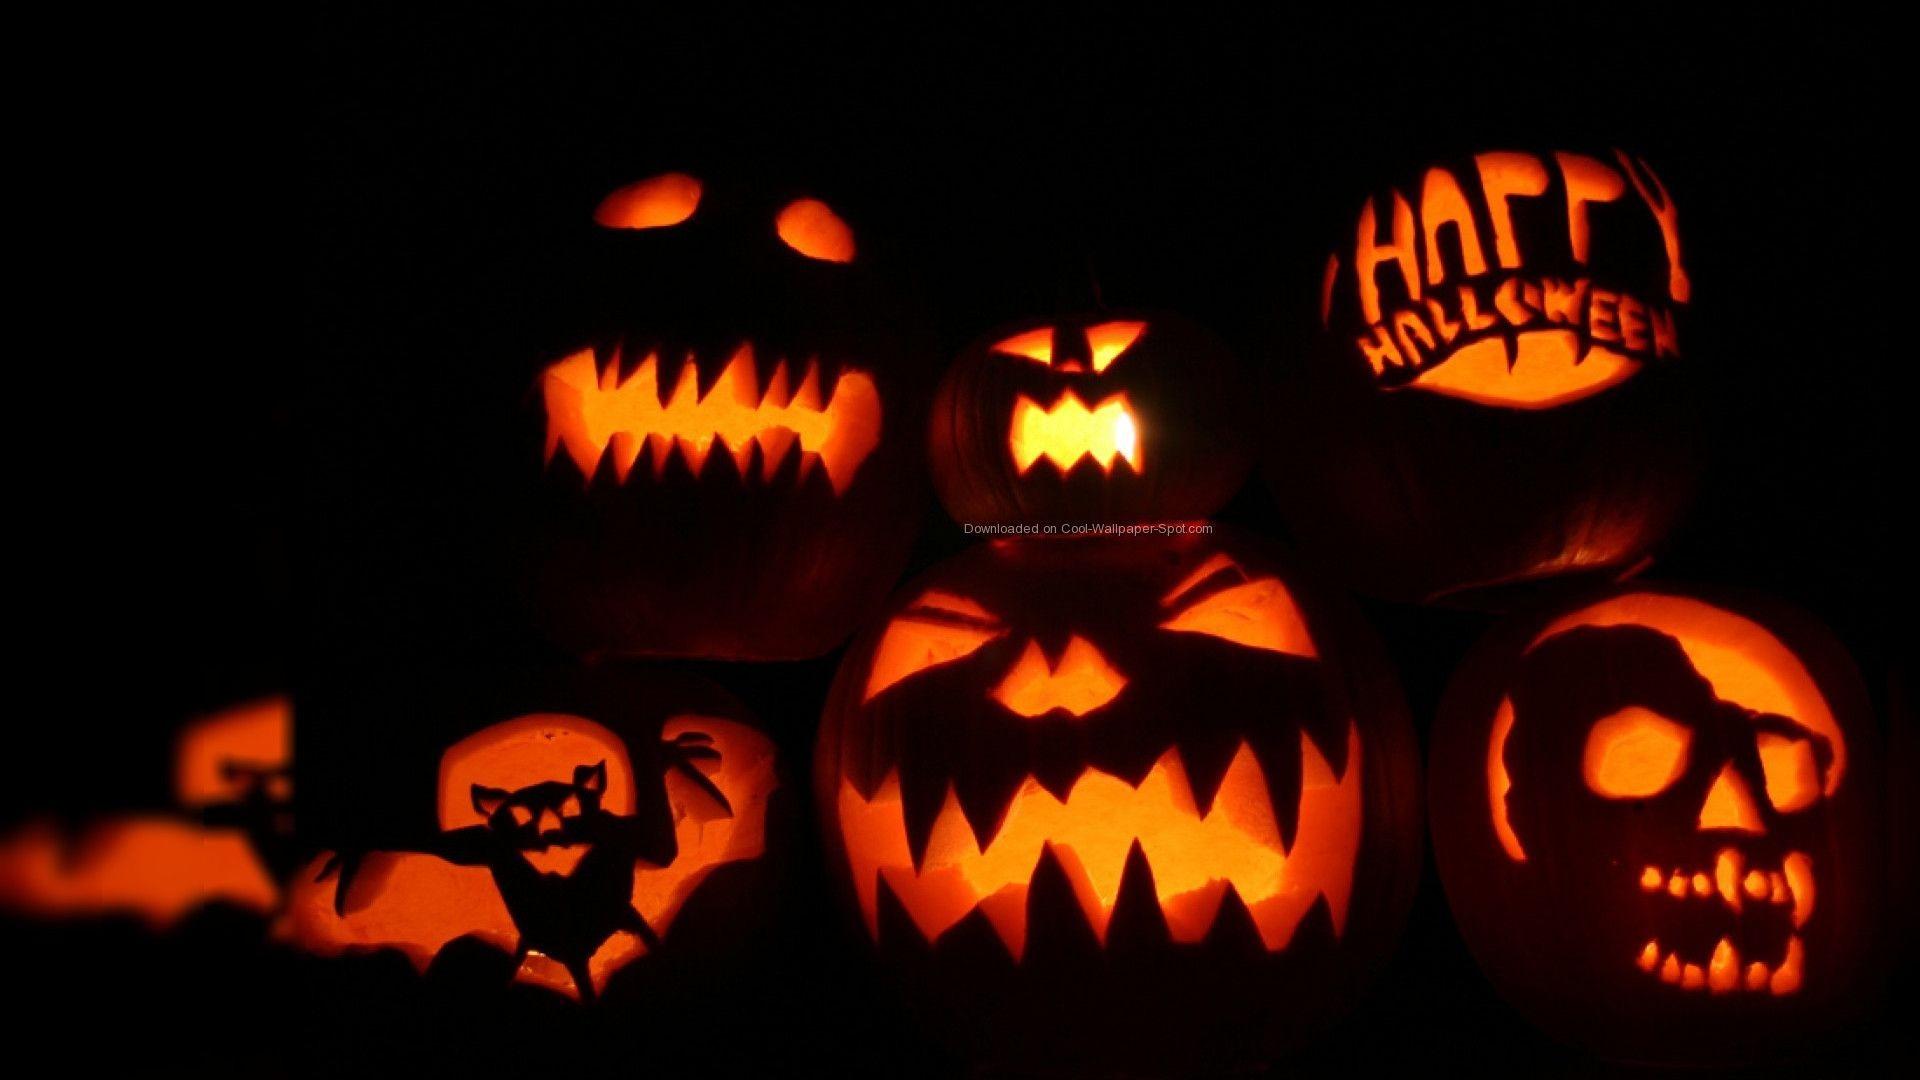 Vertical Halloween Desktop Wallpaper 1920x1080 Pc